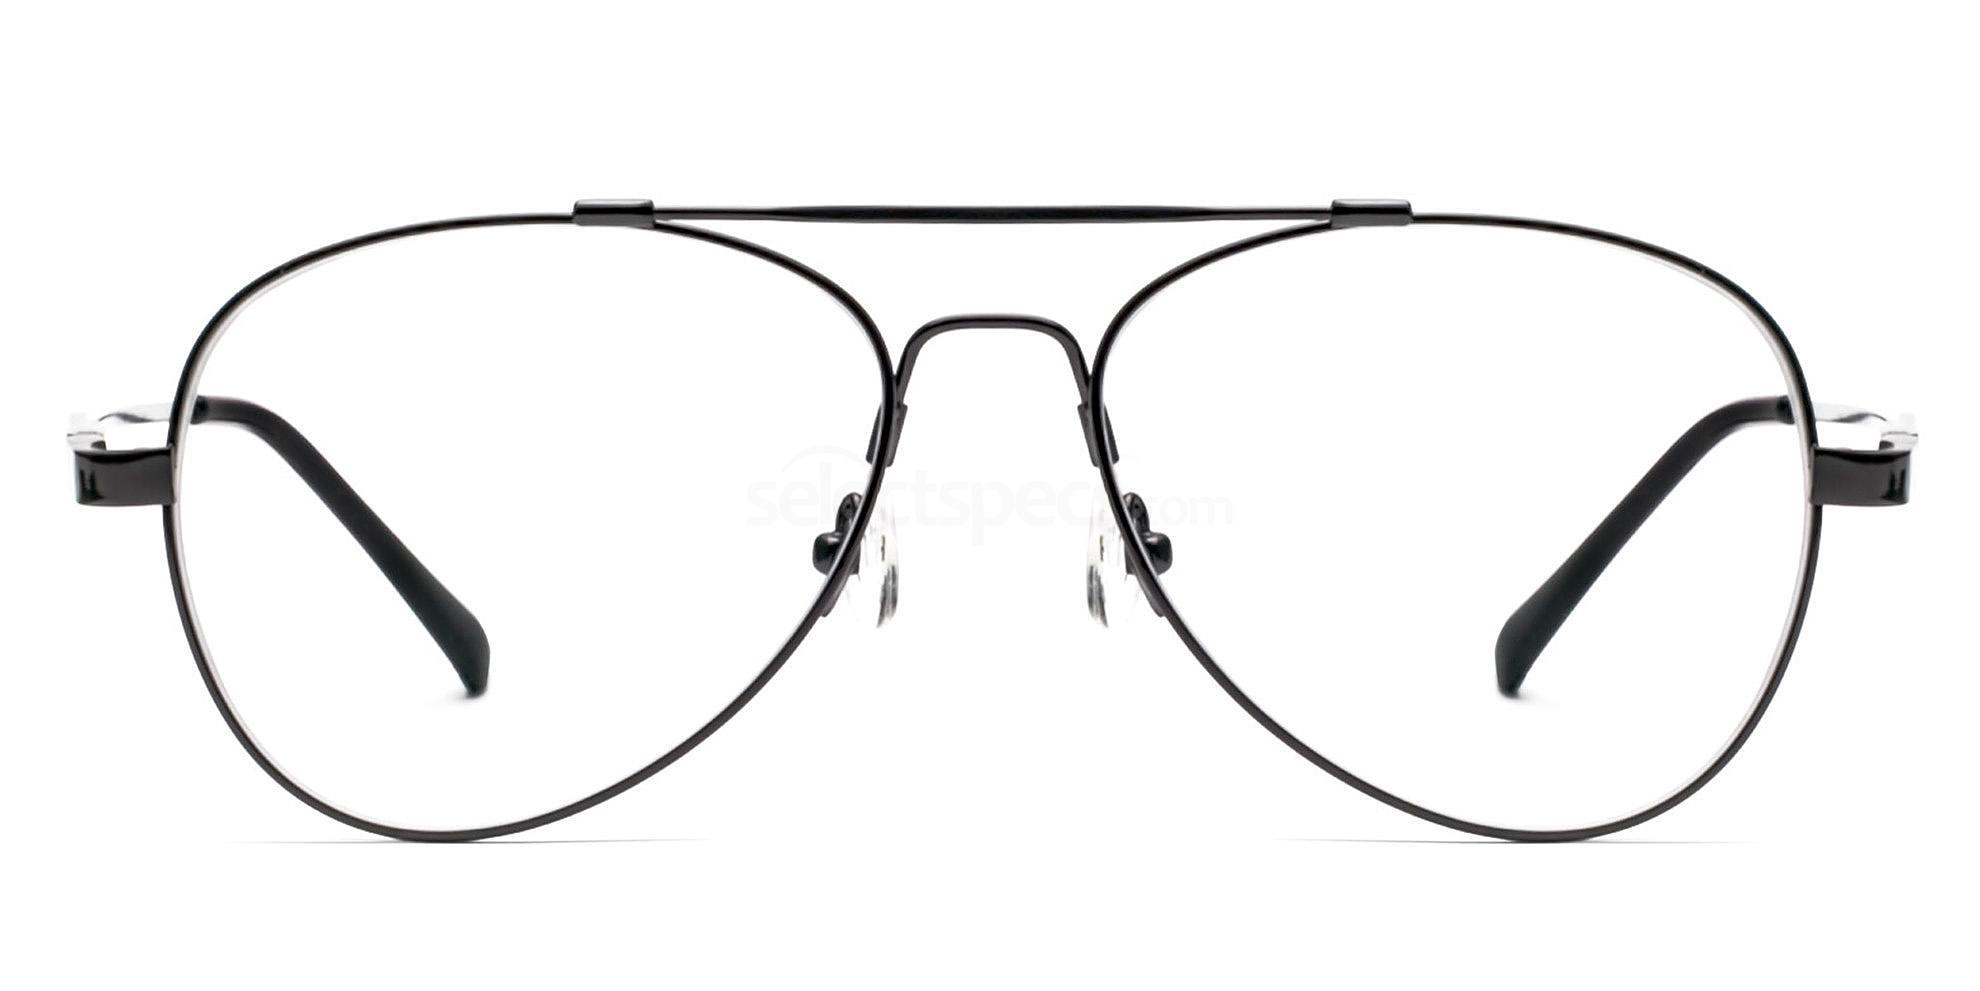 kit harington aviator glasses buy uk